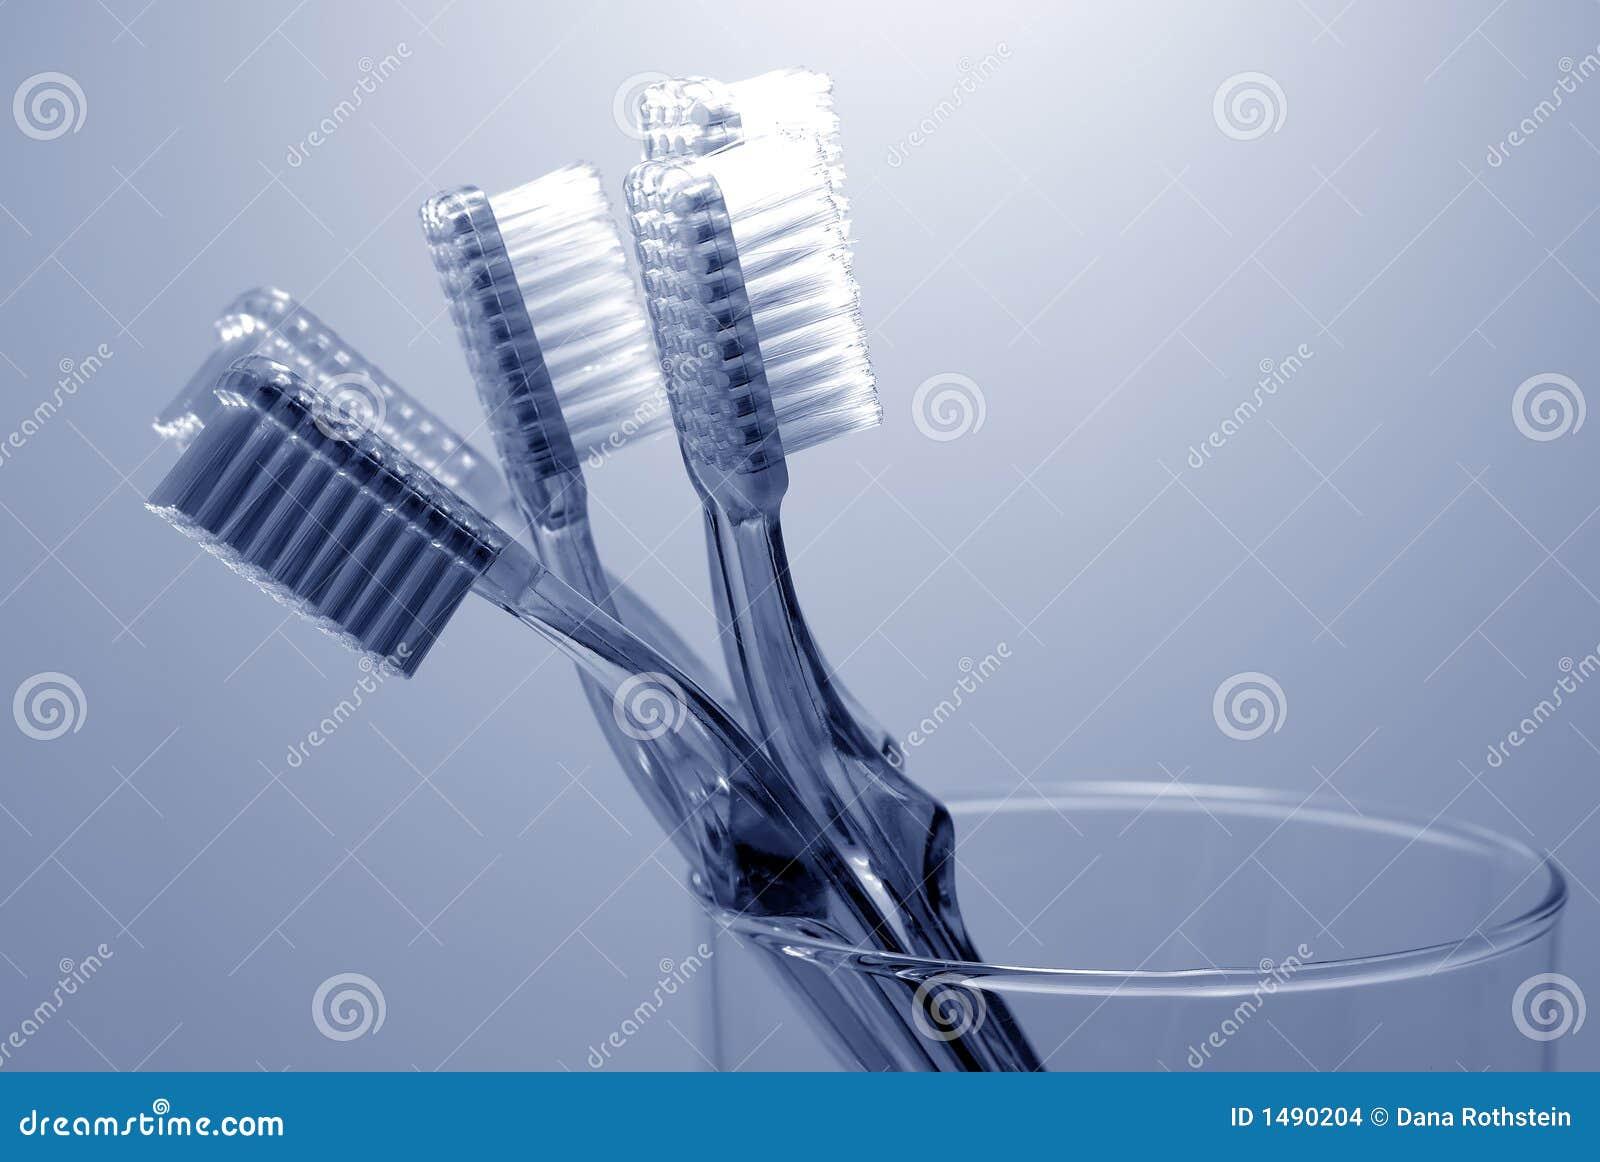 Higieny ustnej